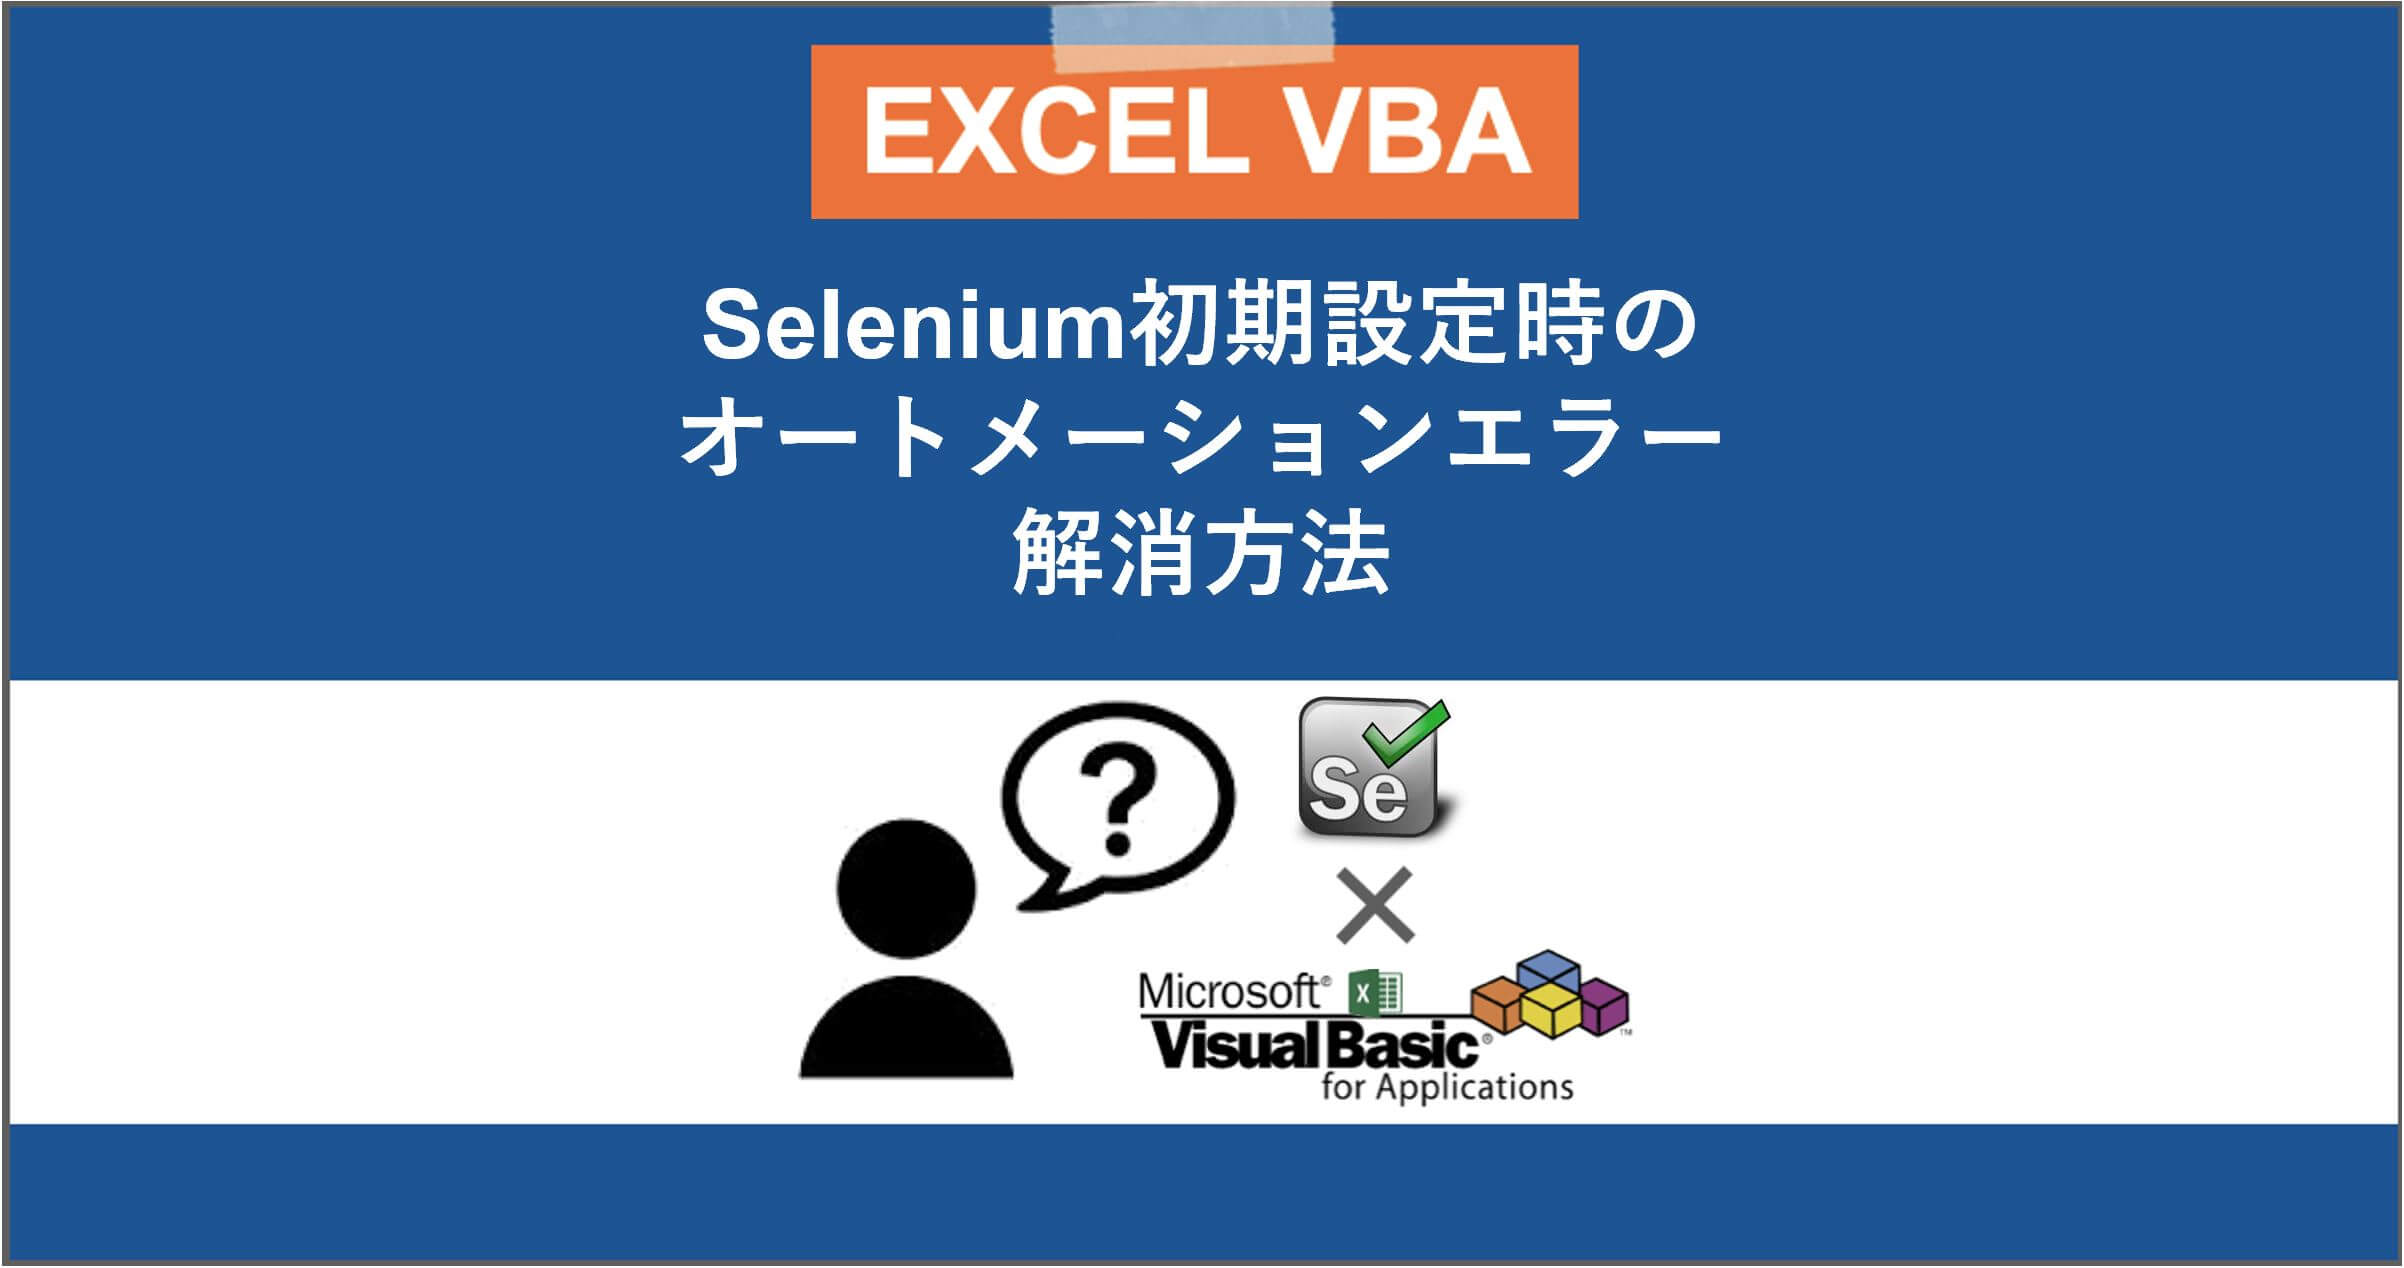 【VBA】Seleniumのオートメーションエラー解消方法